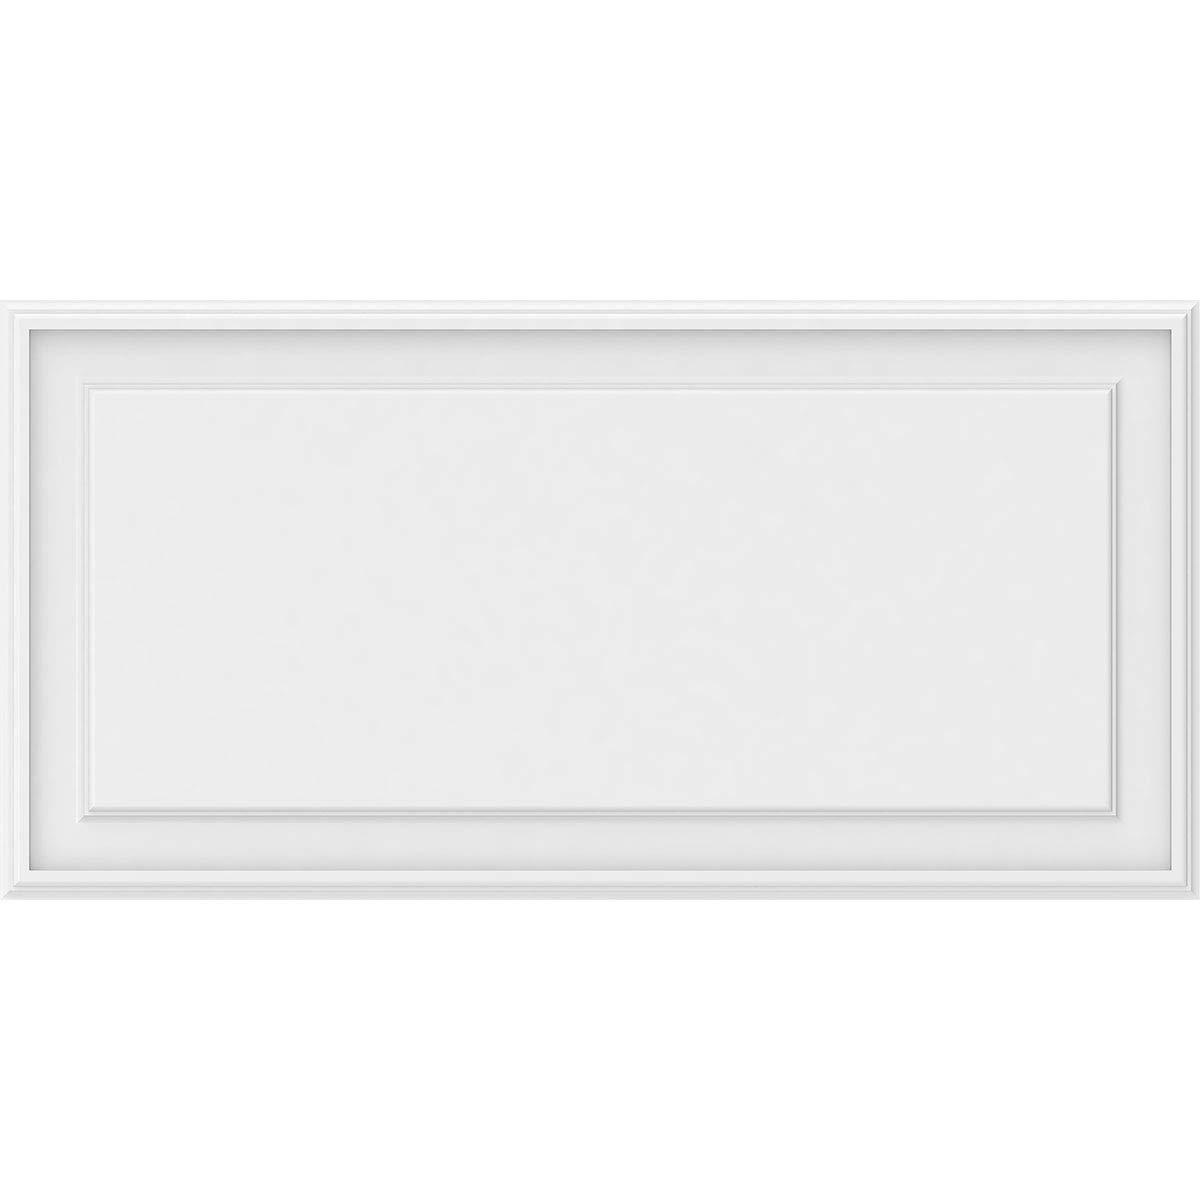 Ekena Millwork WALP40X20X062LEG Wall Panel, 40''W x 20''H x 5/8''P, White by Ekena Millwork